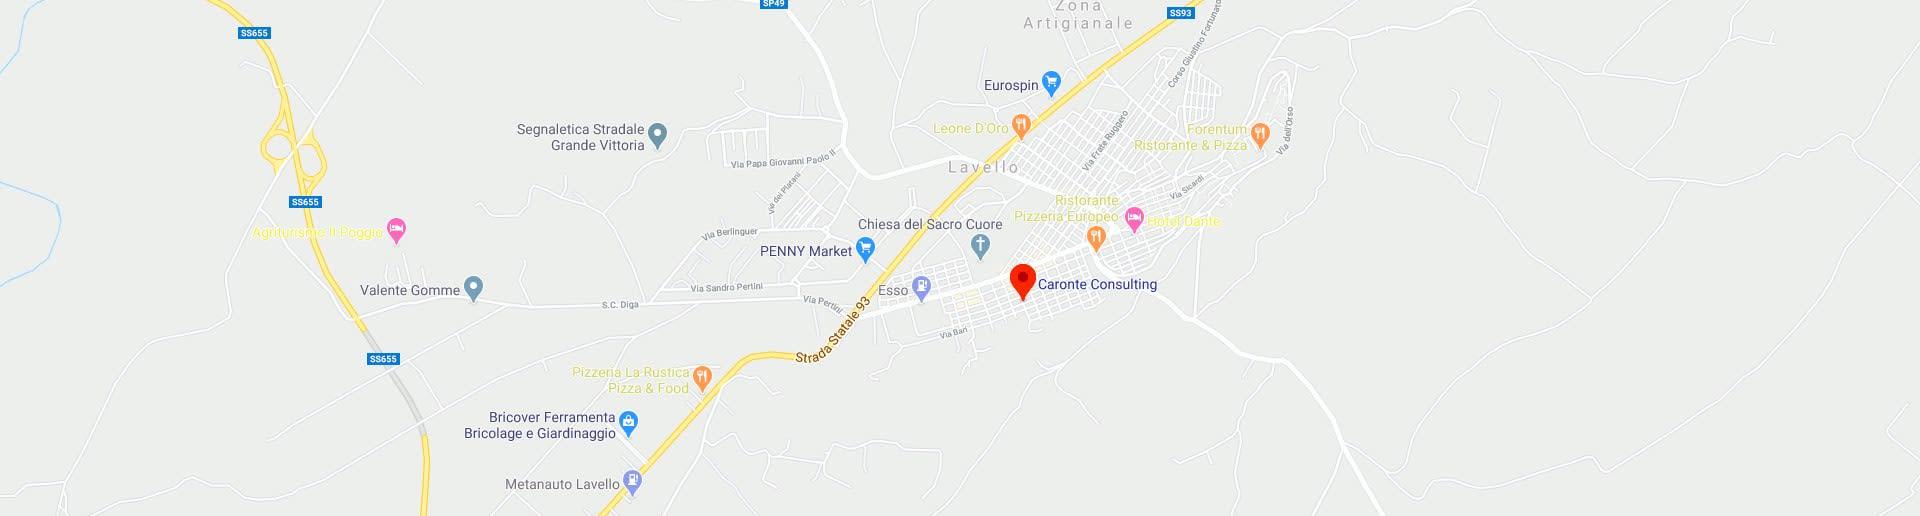 Google Map - Caronte Consulting